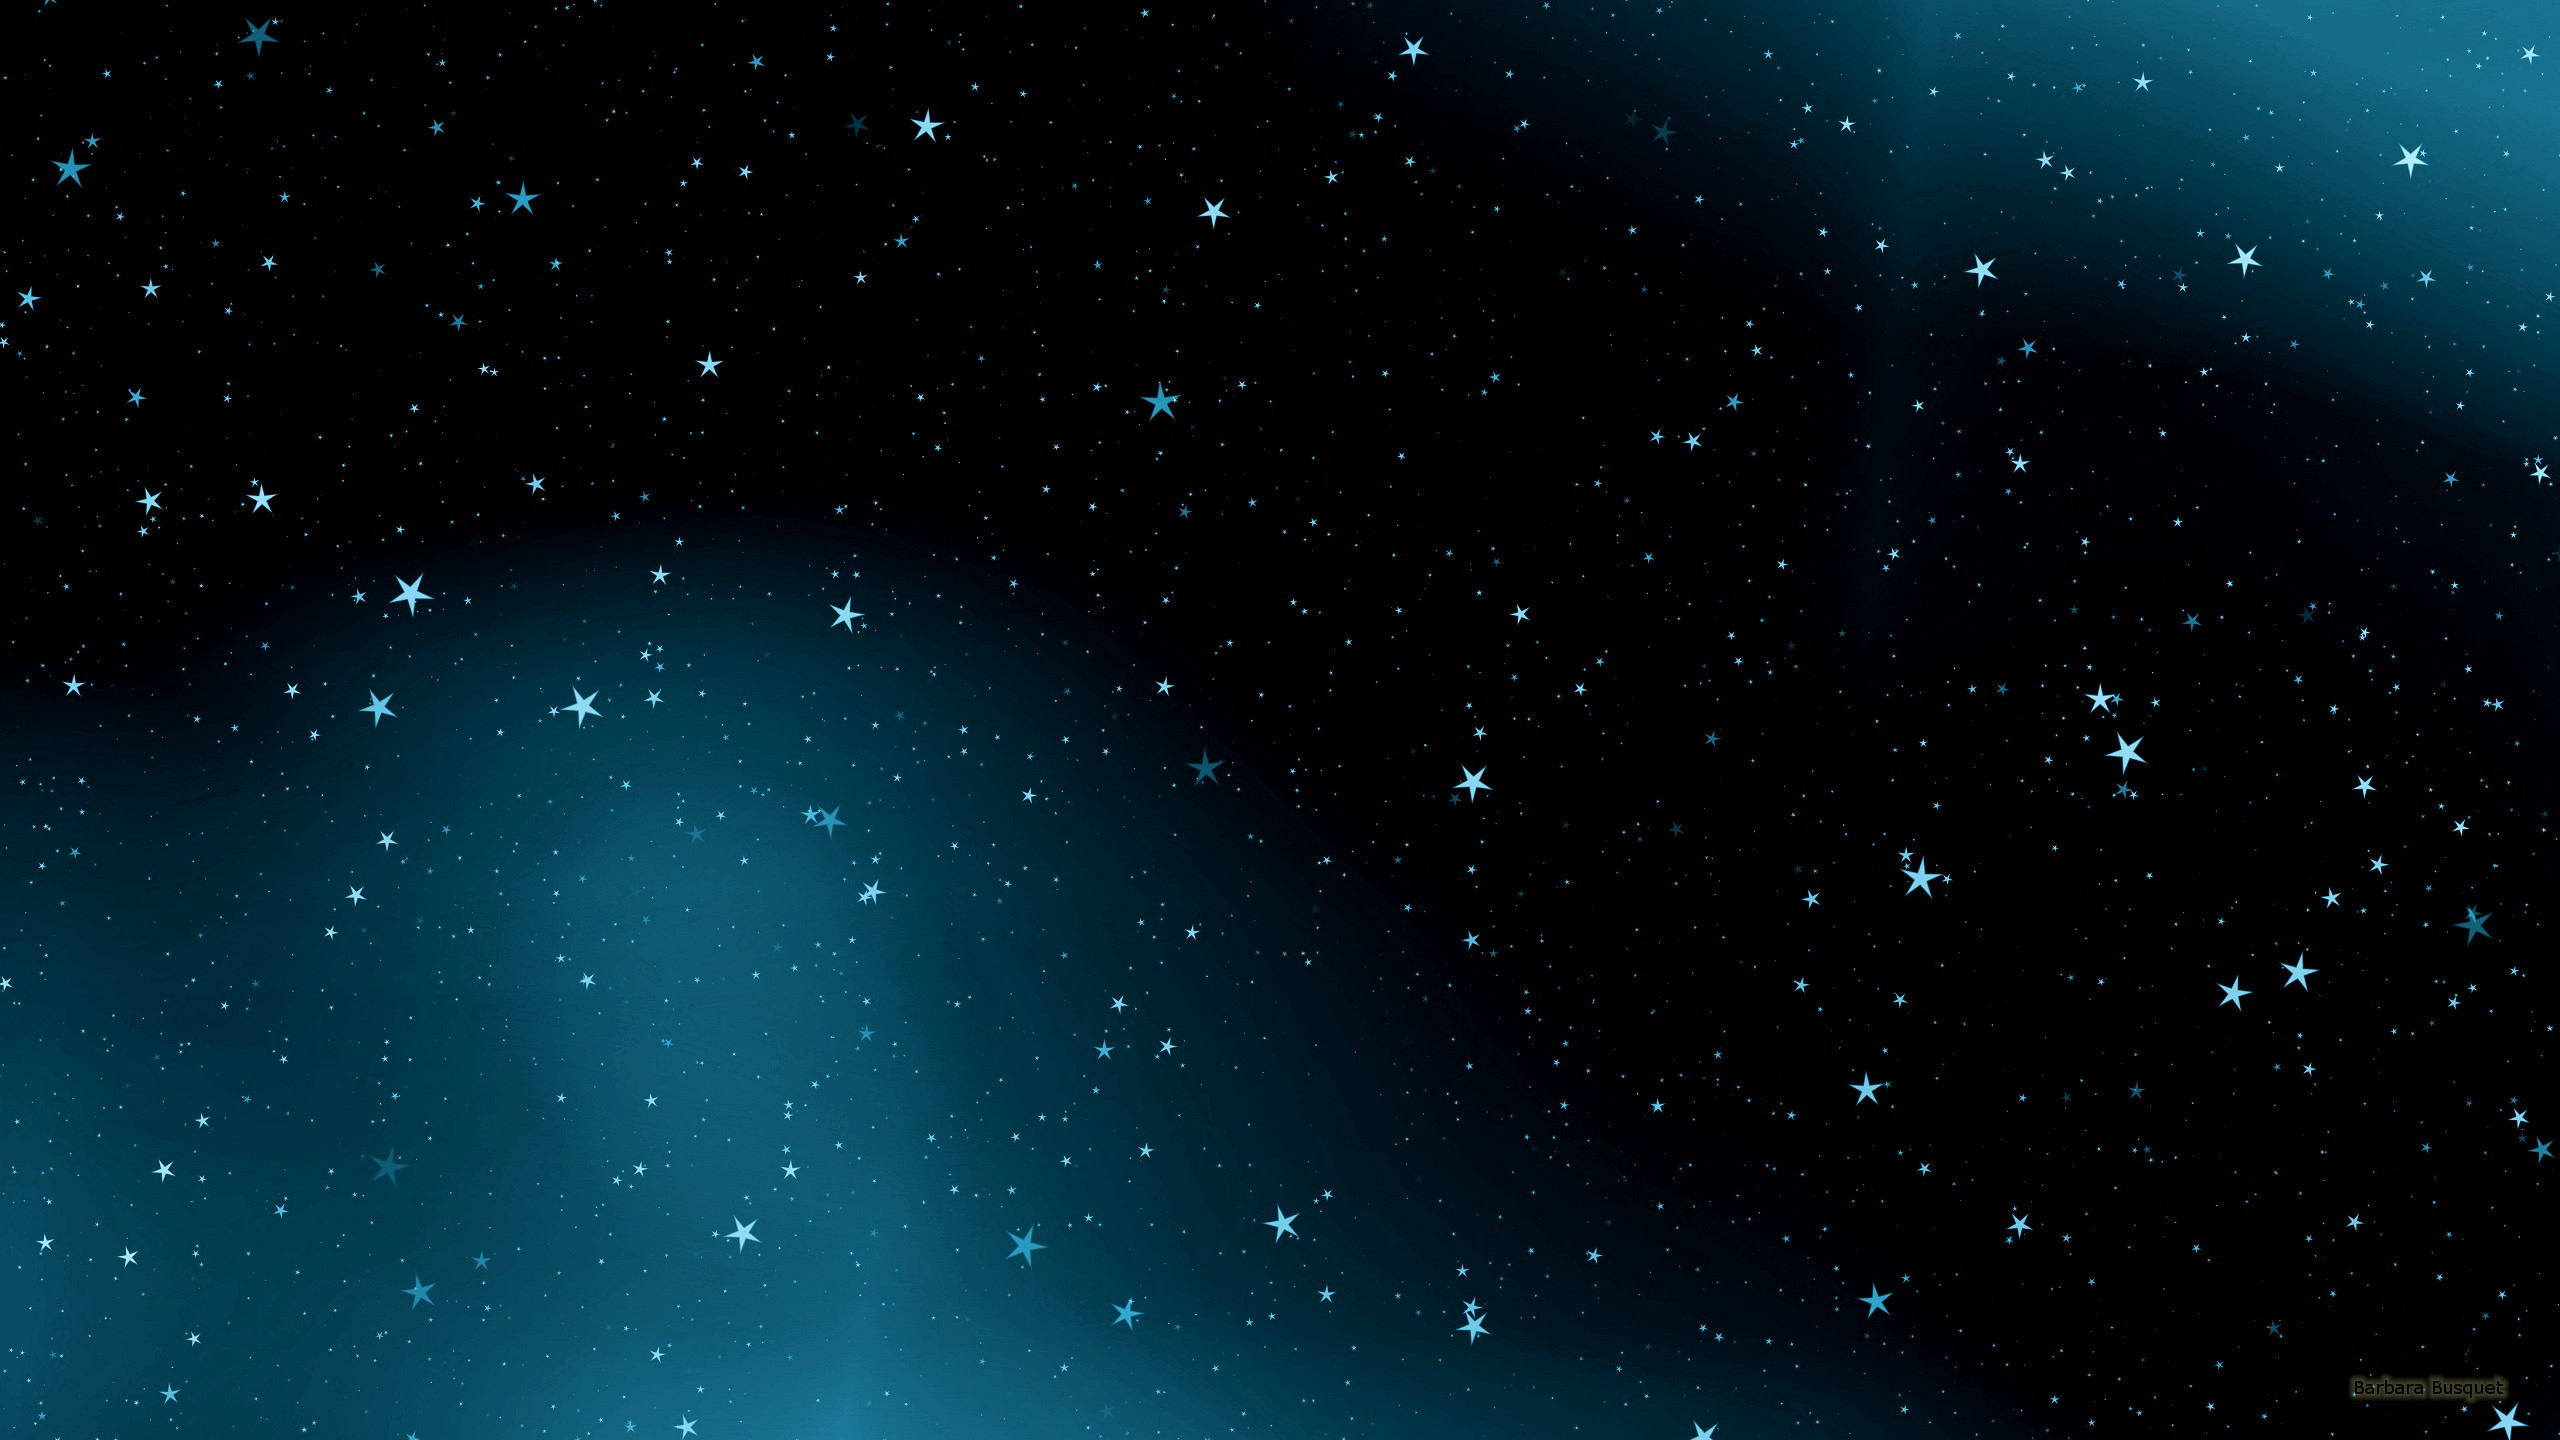 2560x1440 Black Blue Galaxy Wallpaper Download BBlue